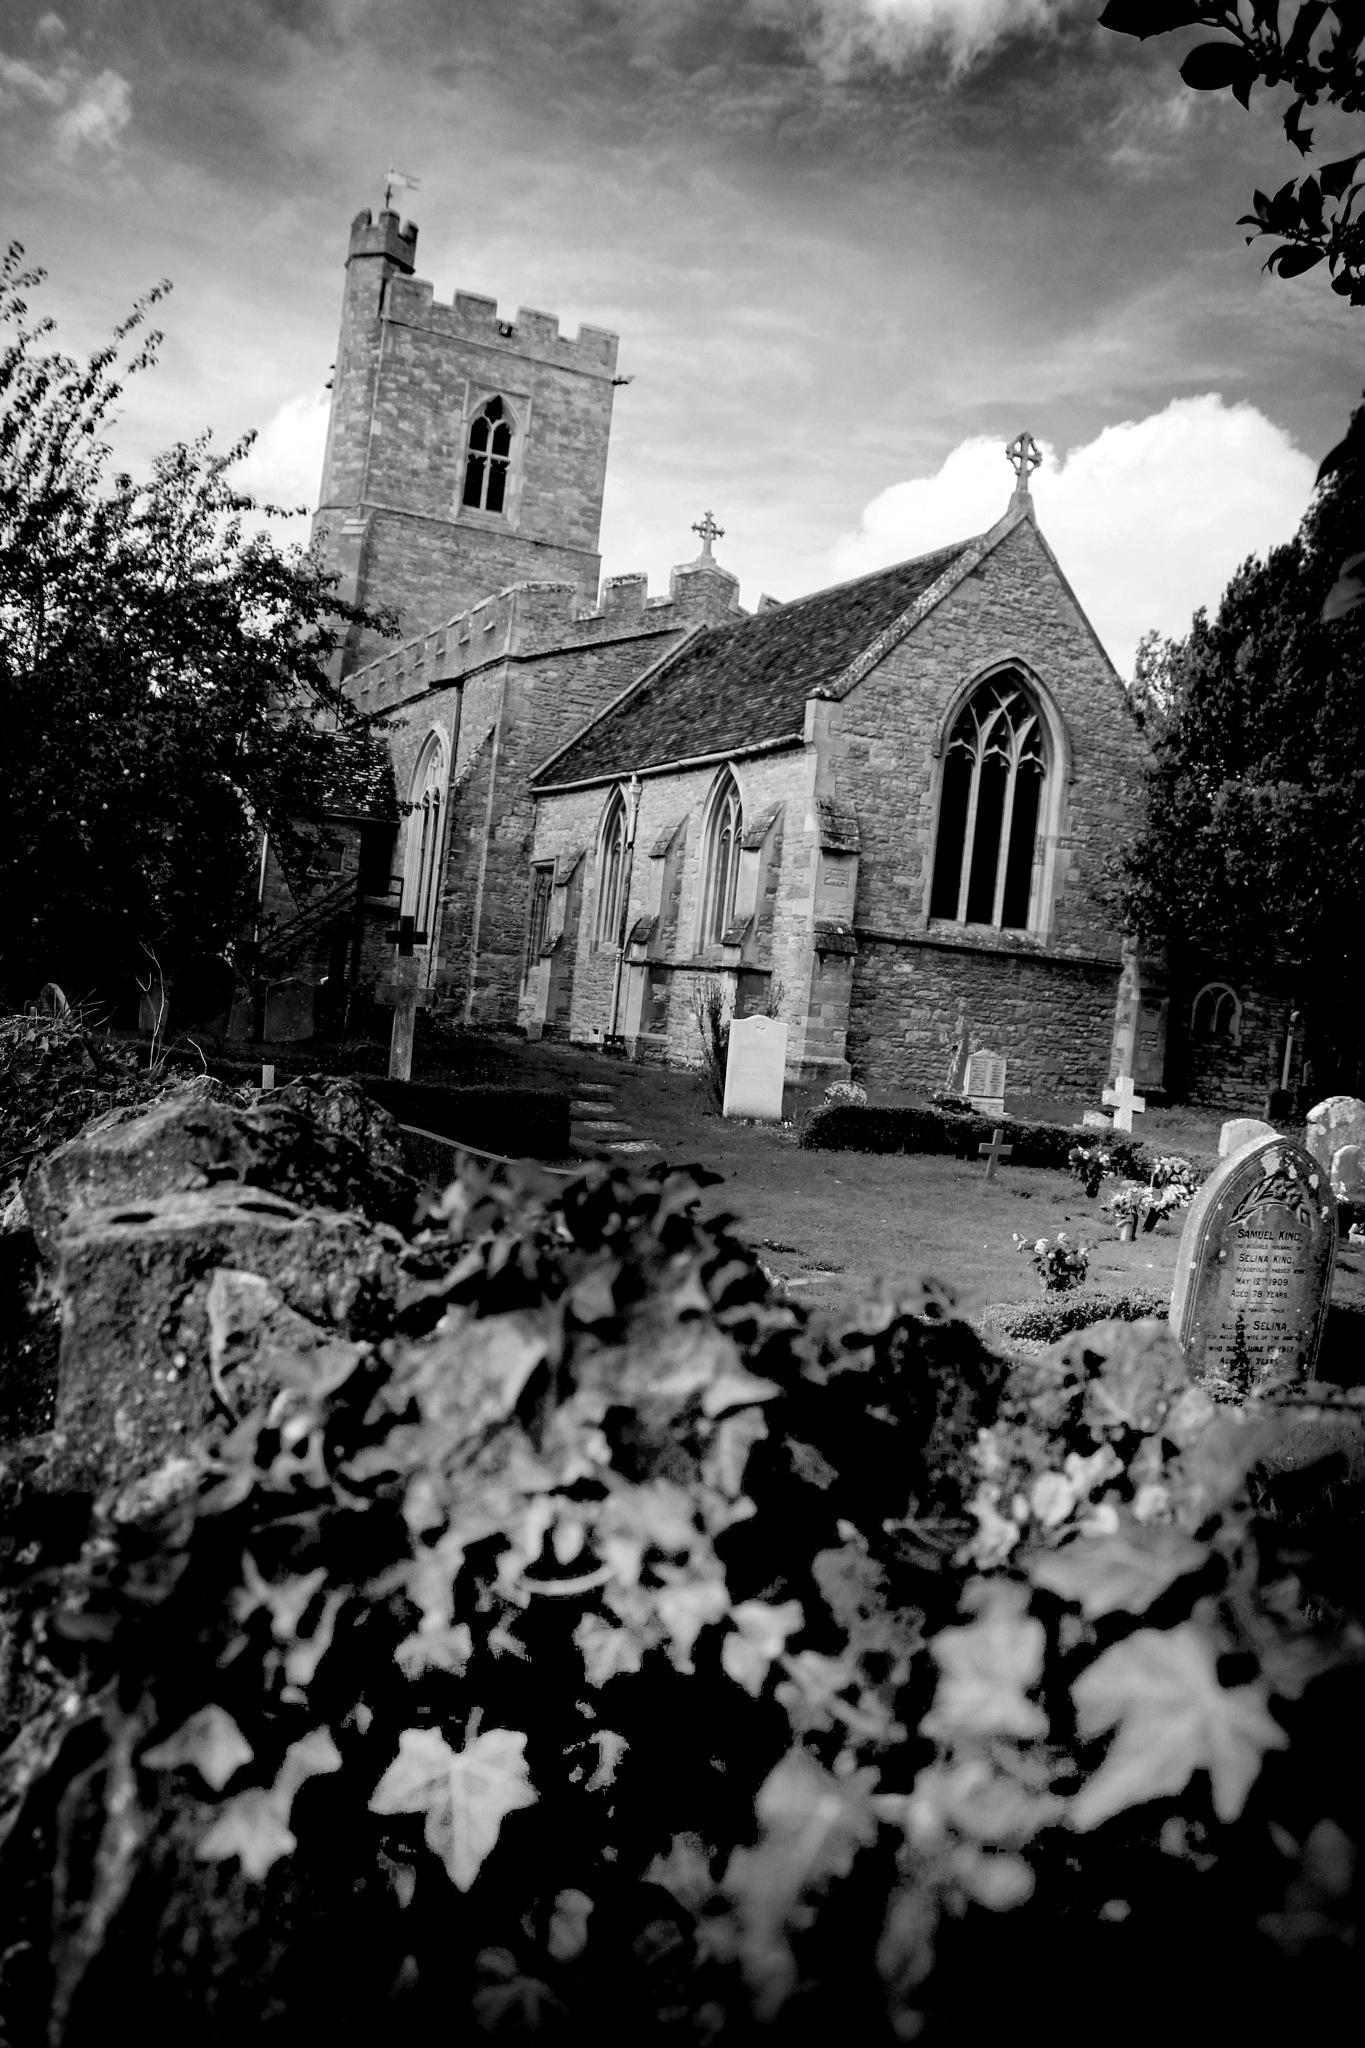 Saint Owen's by MartinIngley